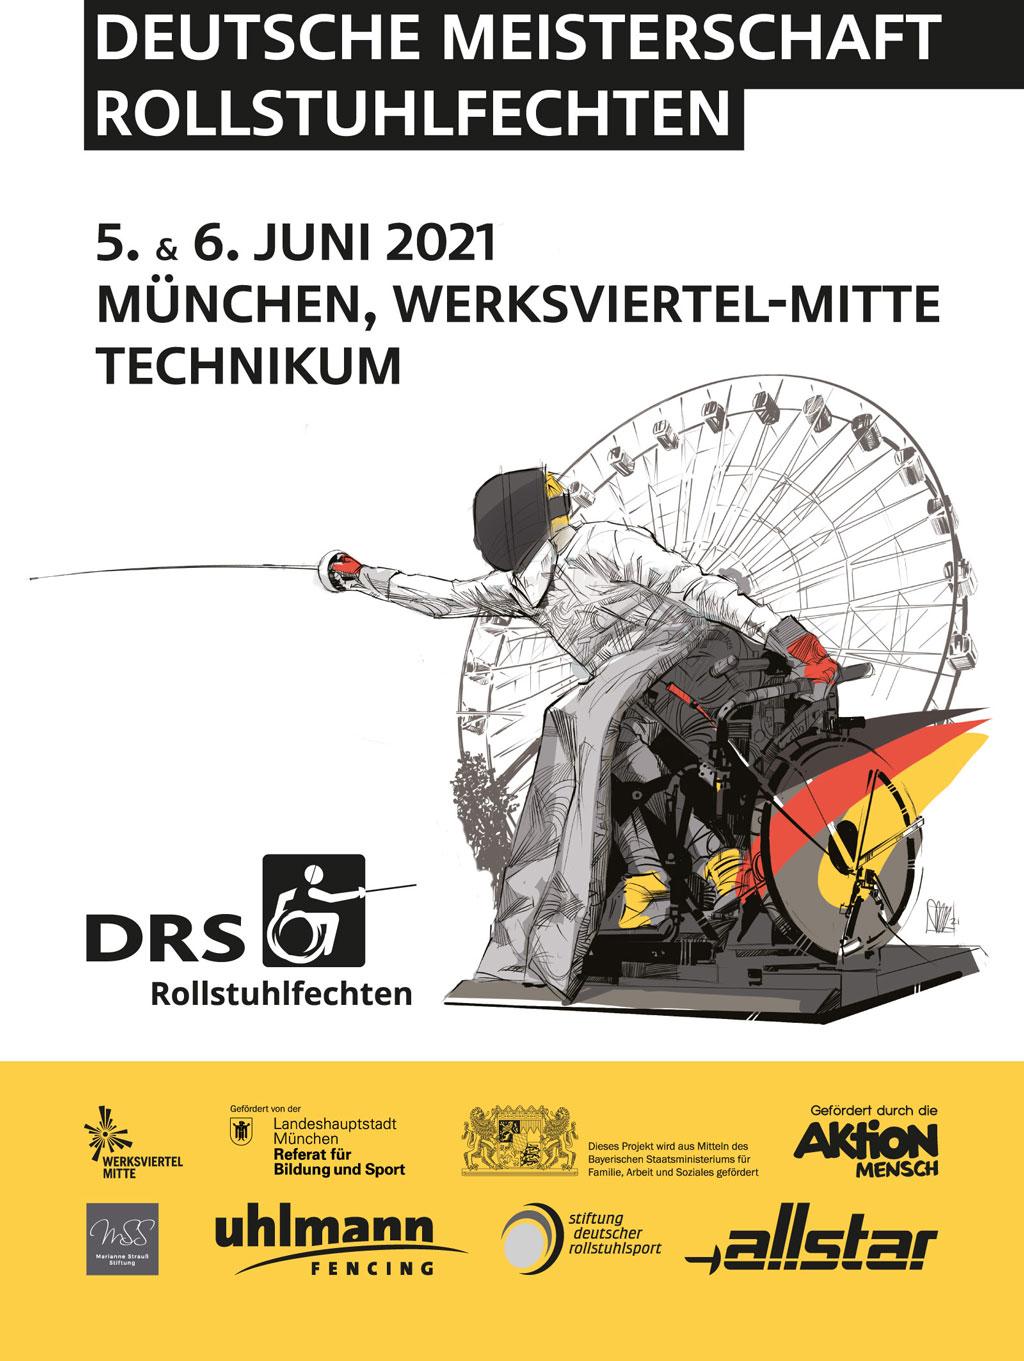 Deutsche Meisterschaften Rollstuhlfechten 2021